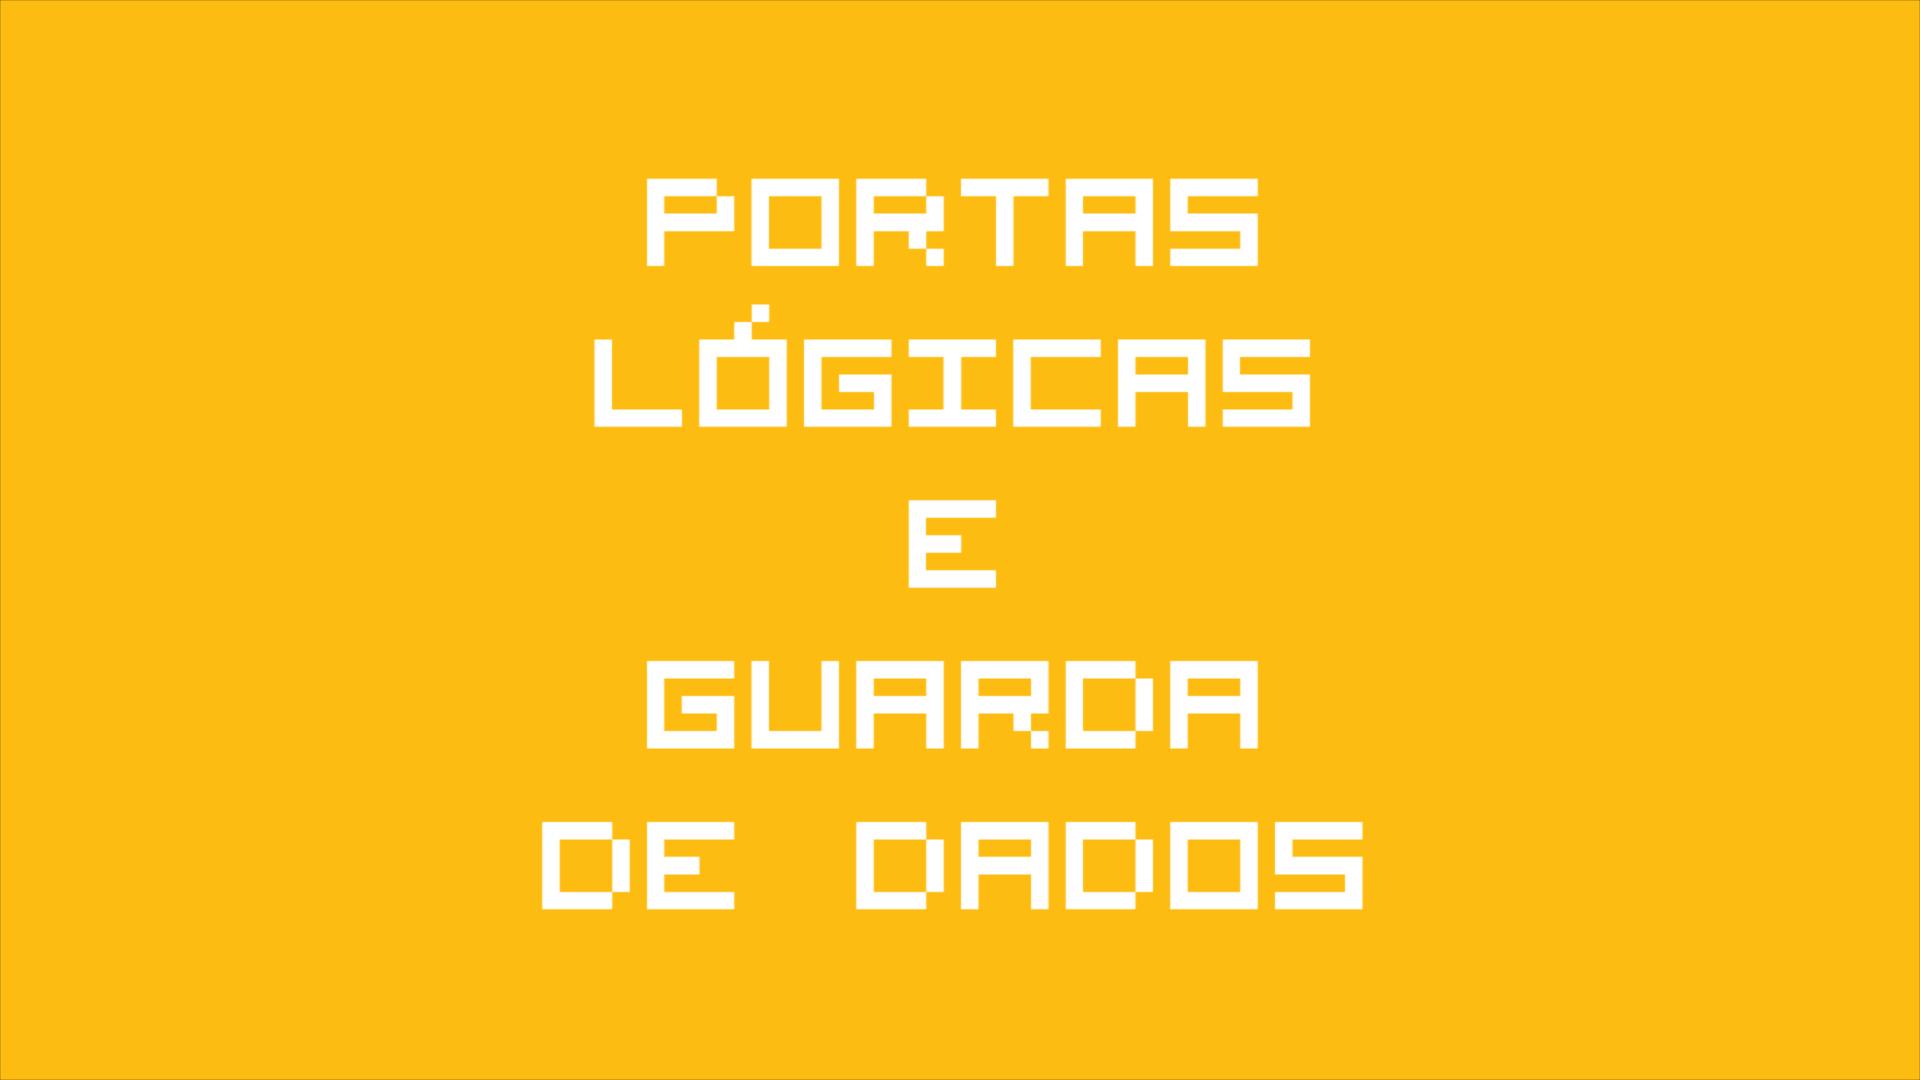 Portas Lógicas, Guarda de Dados